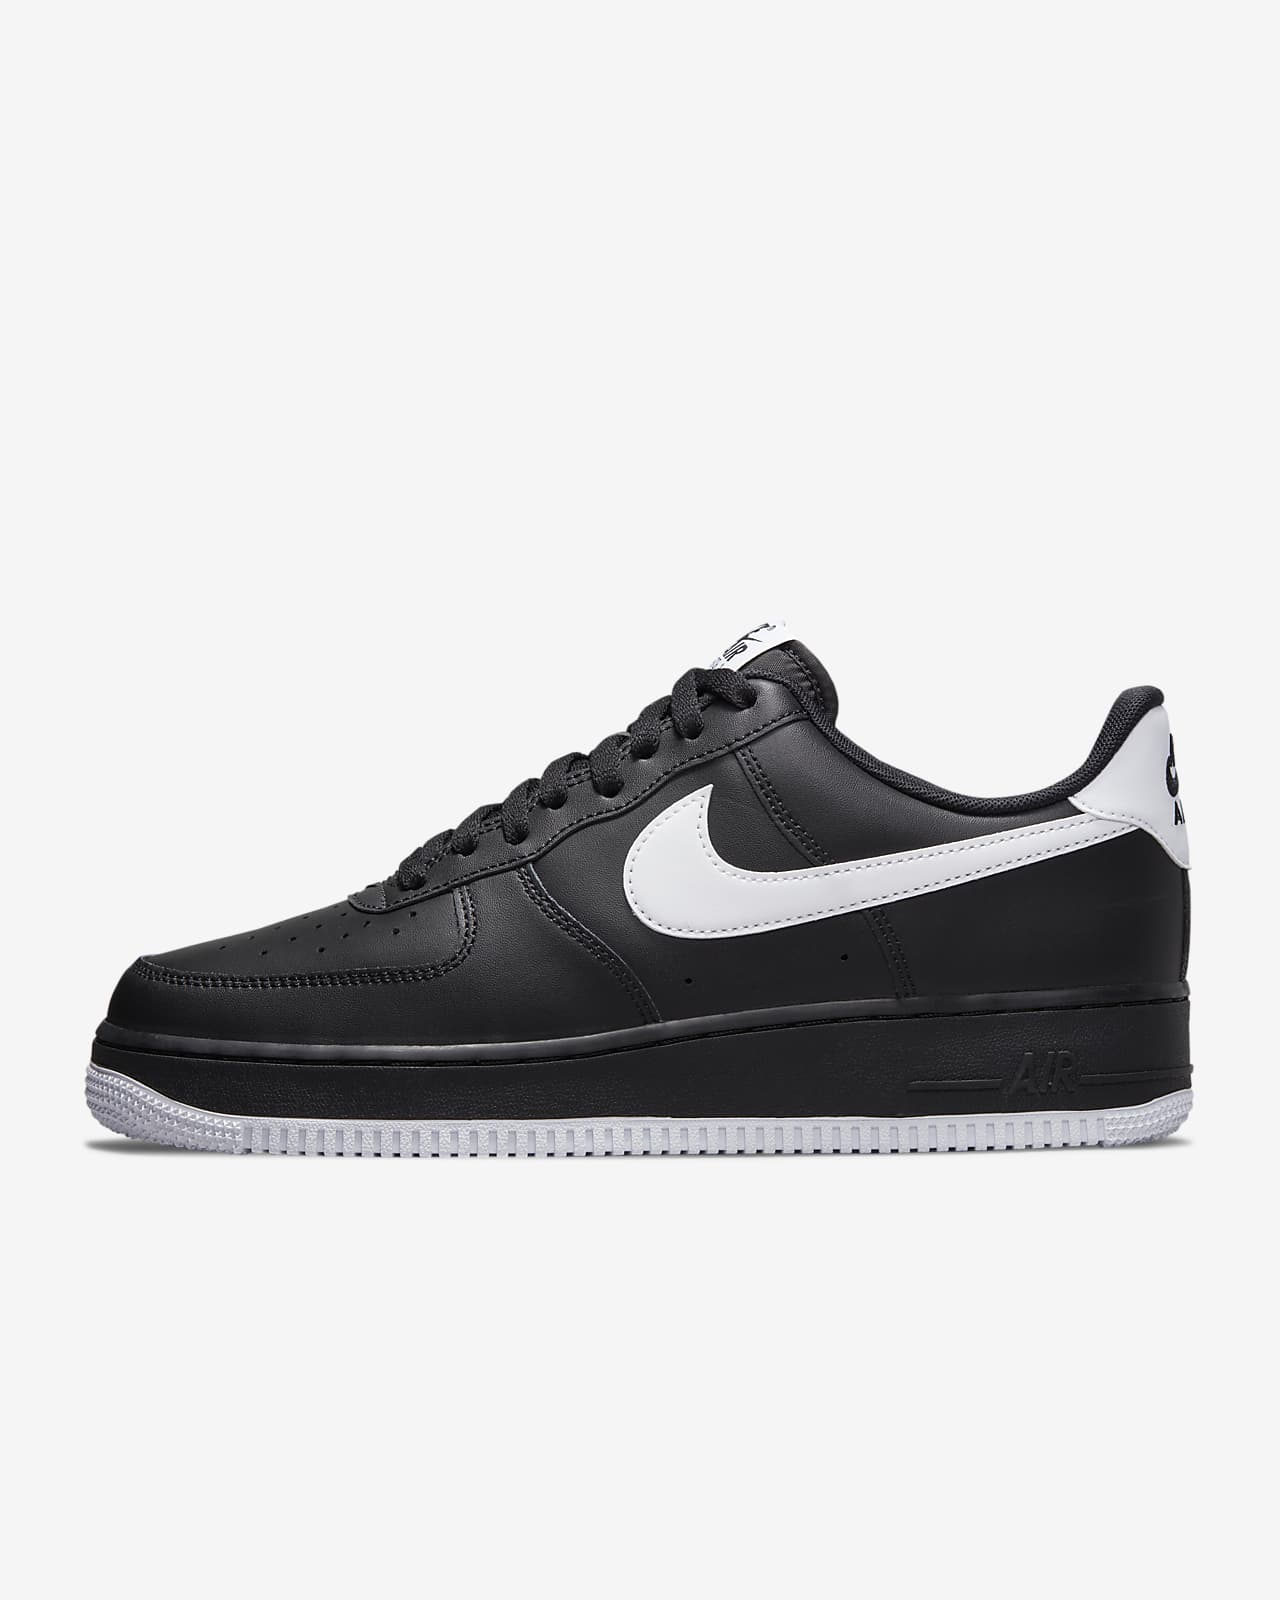 Nike Air Force 1 '07 'Black / White'